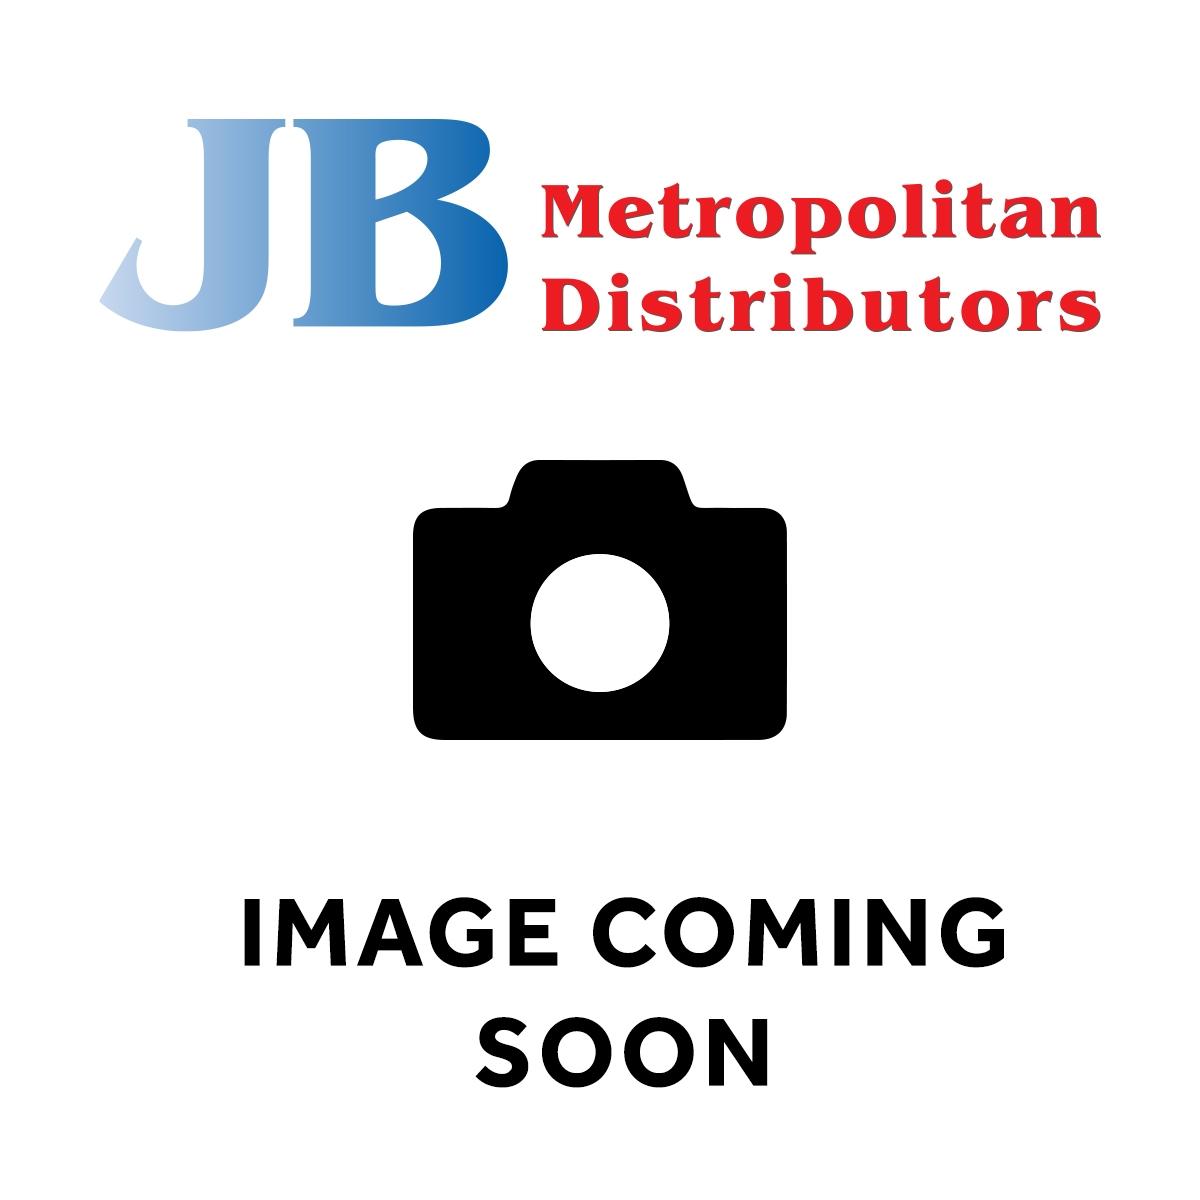 200ML JUST JUICE ORANGE